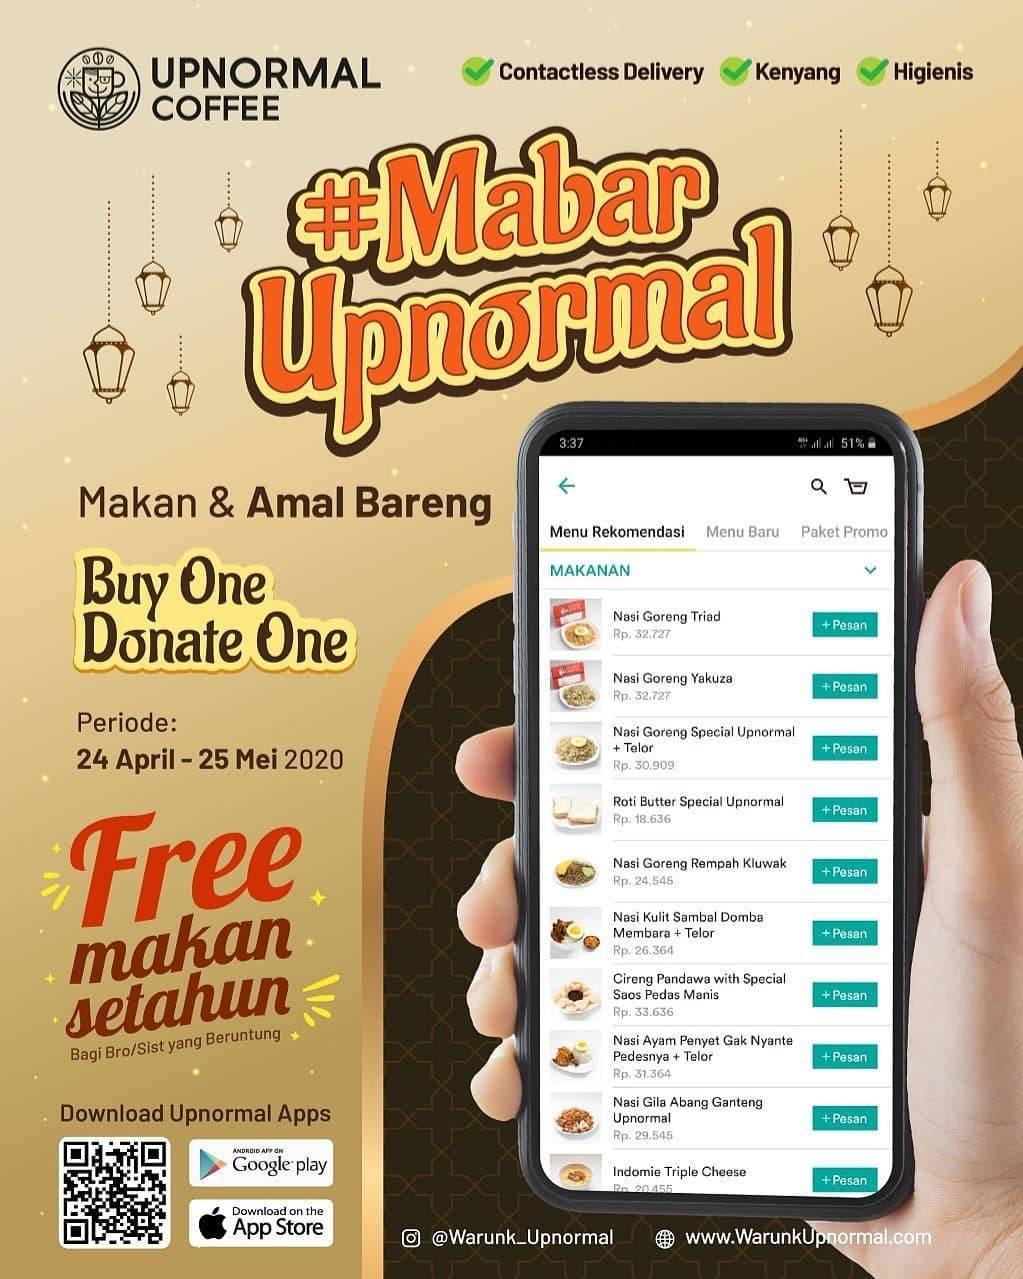 Diskon Warunk Upnormal Promo Mabar Upnormal, Beli 1 Donasikan 1 Paket Makanan